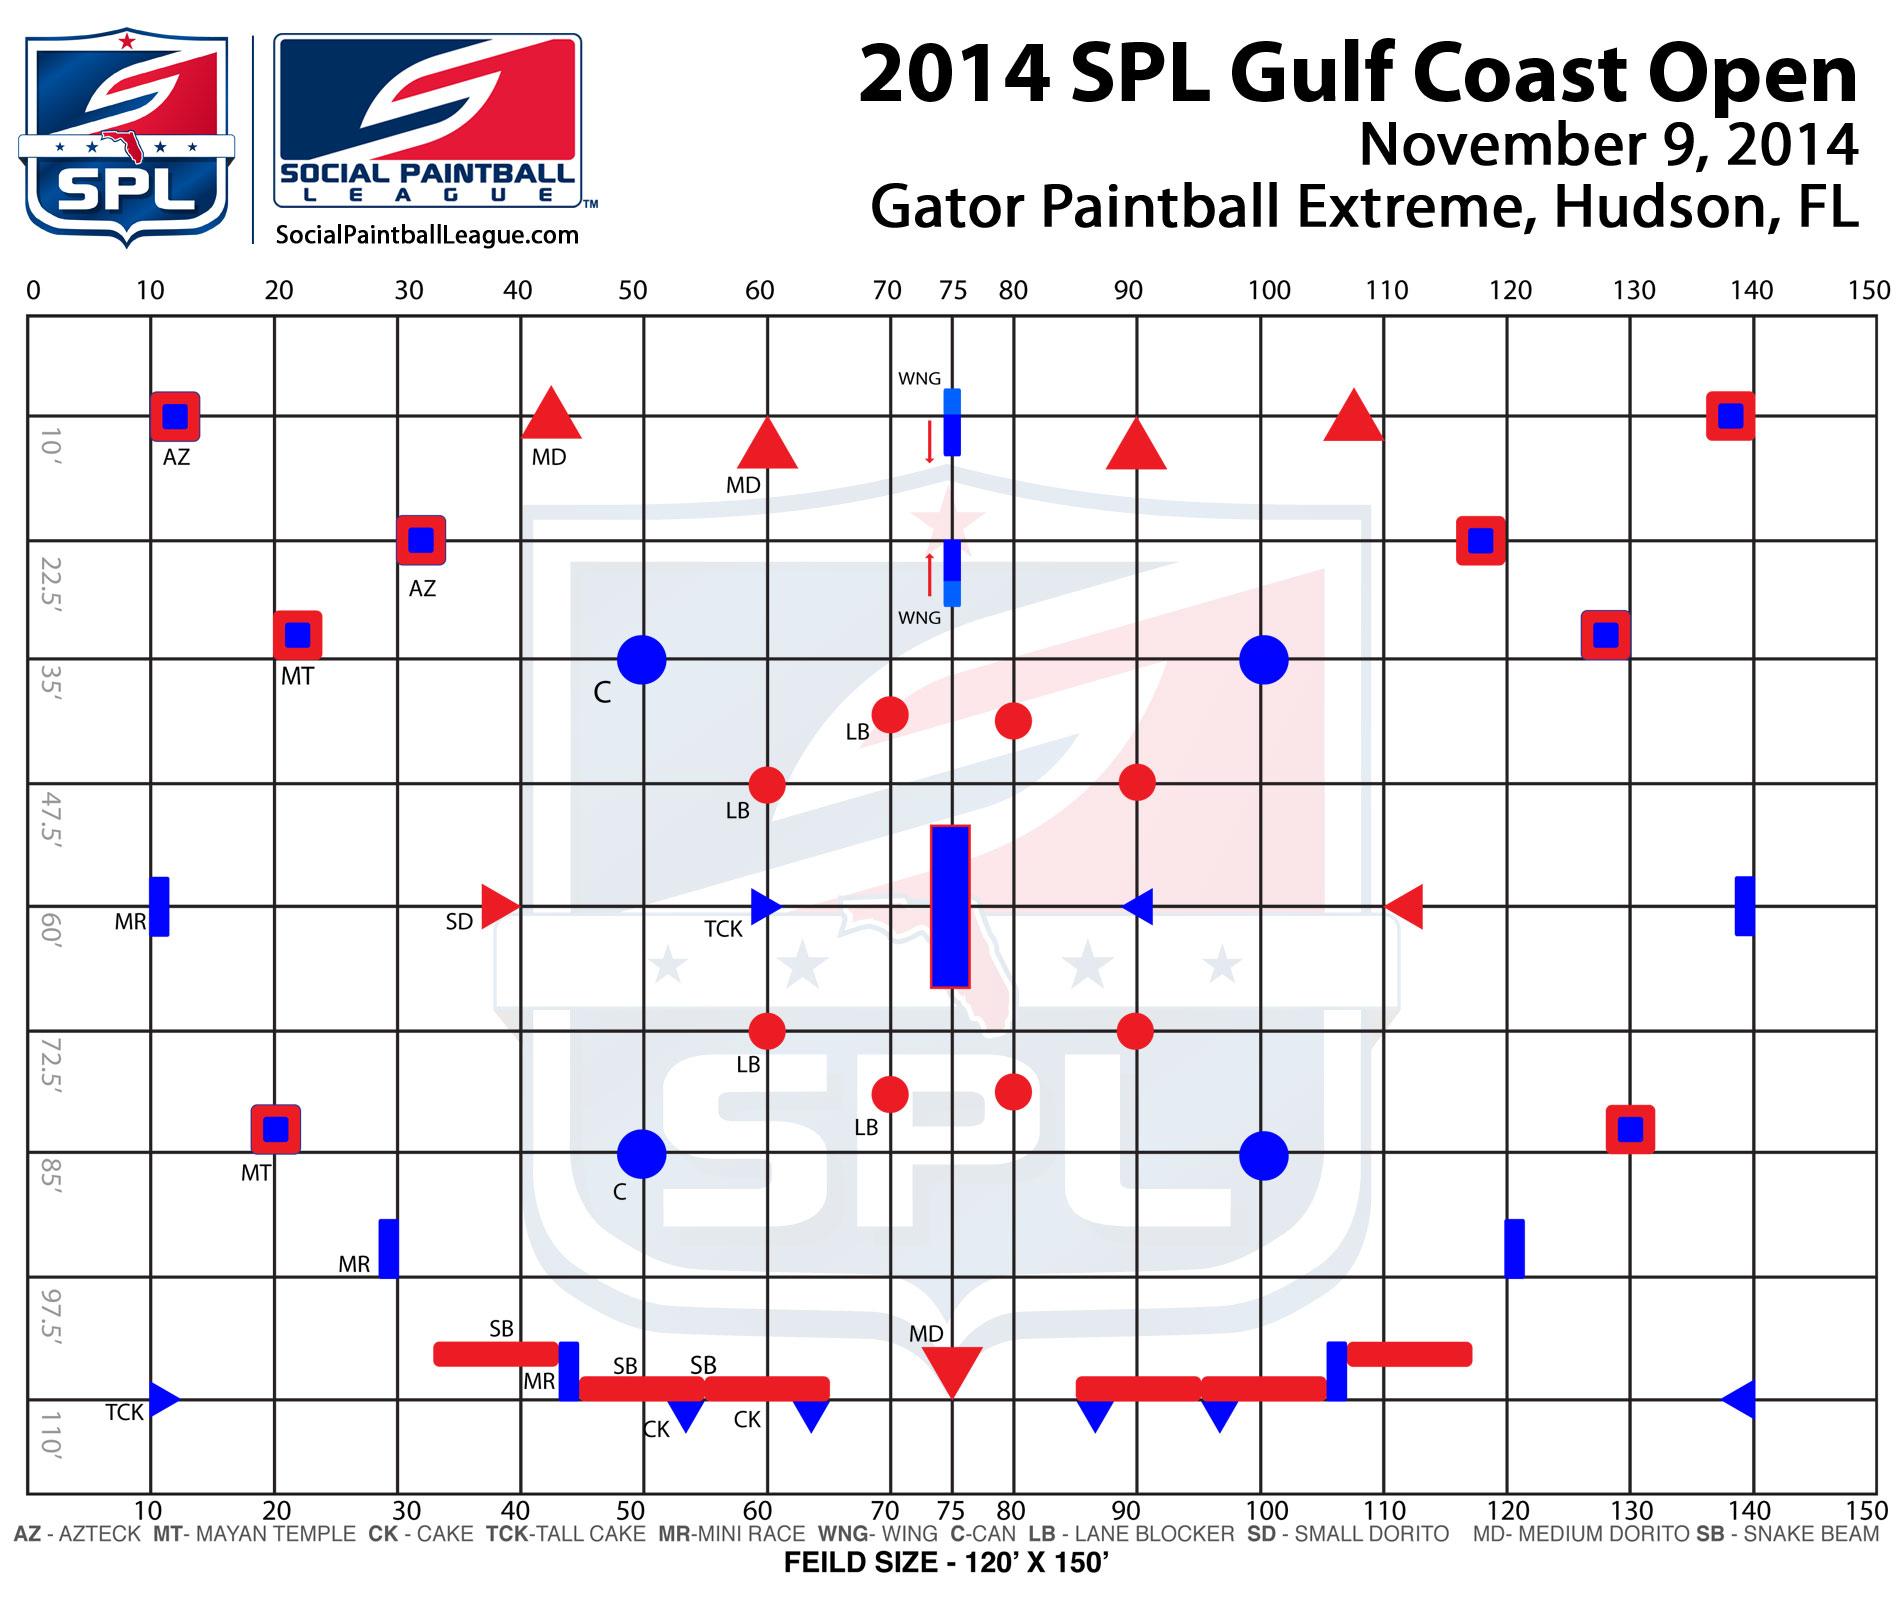 2014 SPL Gulf Coast Open layout